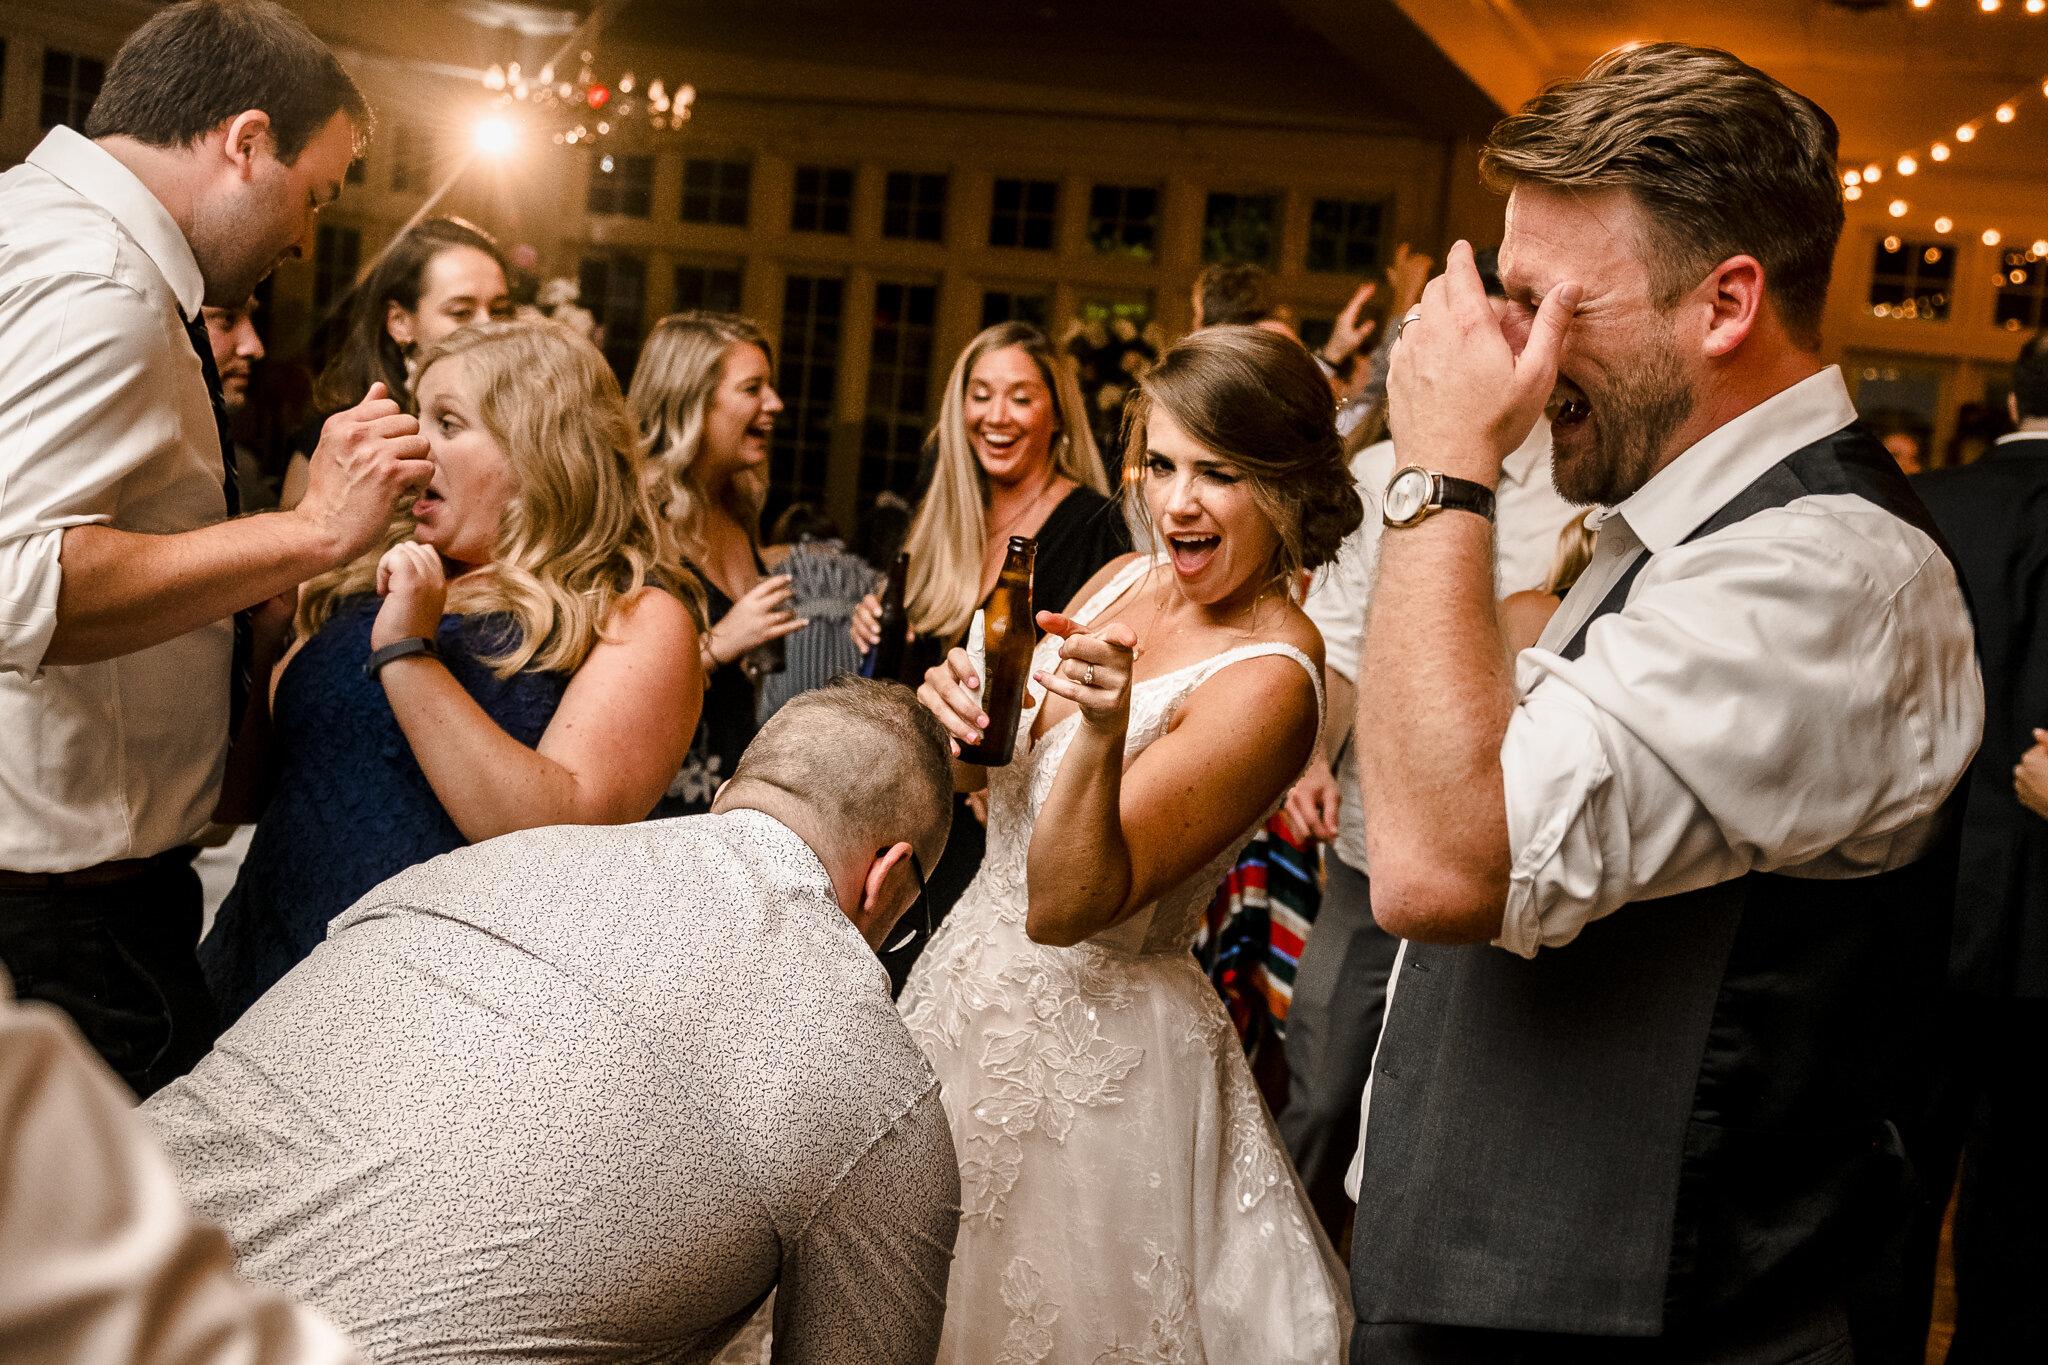 Coyle-Forsgate-Country-Club-Wedding-Photographer-49.JPG